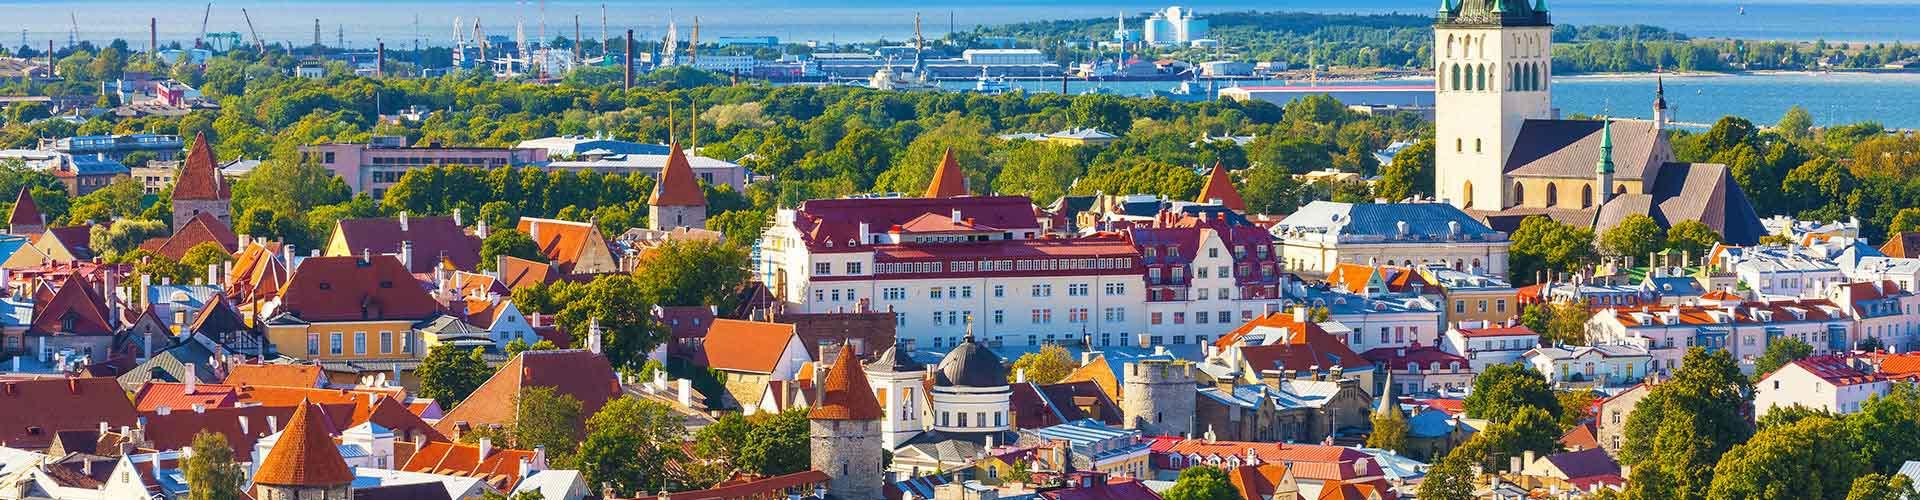 Tallinn - Chambres à Tallinn. Cartes pour Tallinn, photos et commentaires pour chaque chambre à Tallinn.